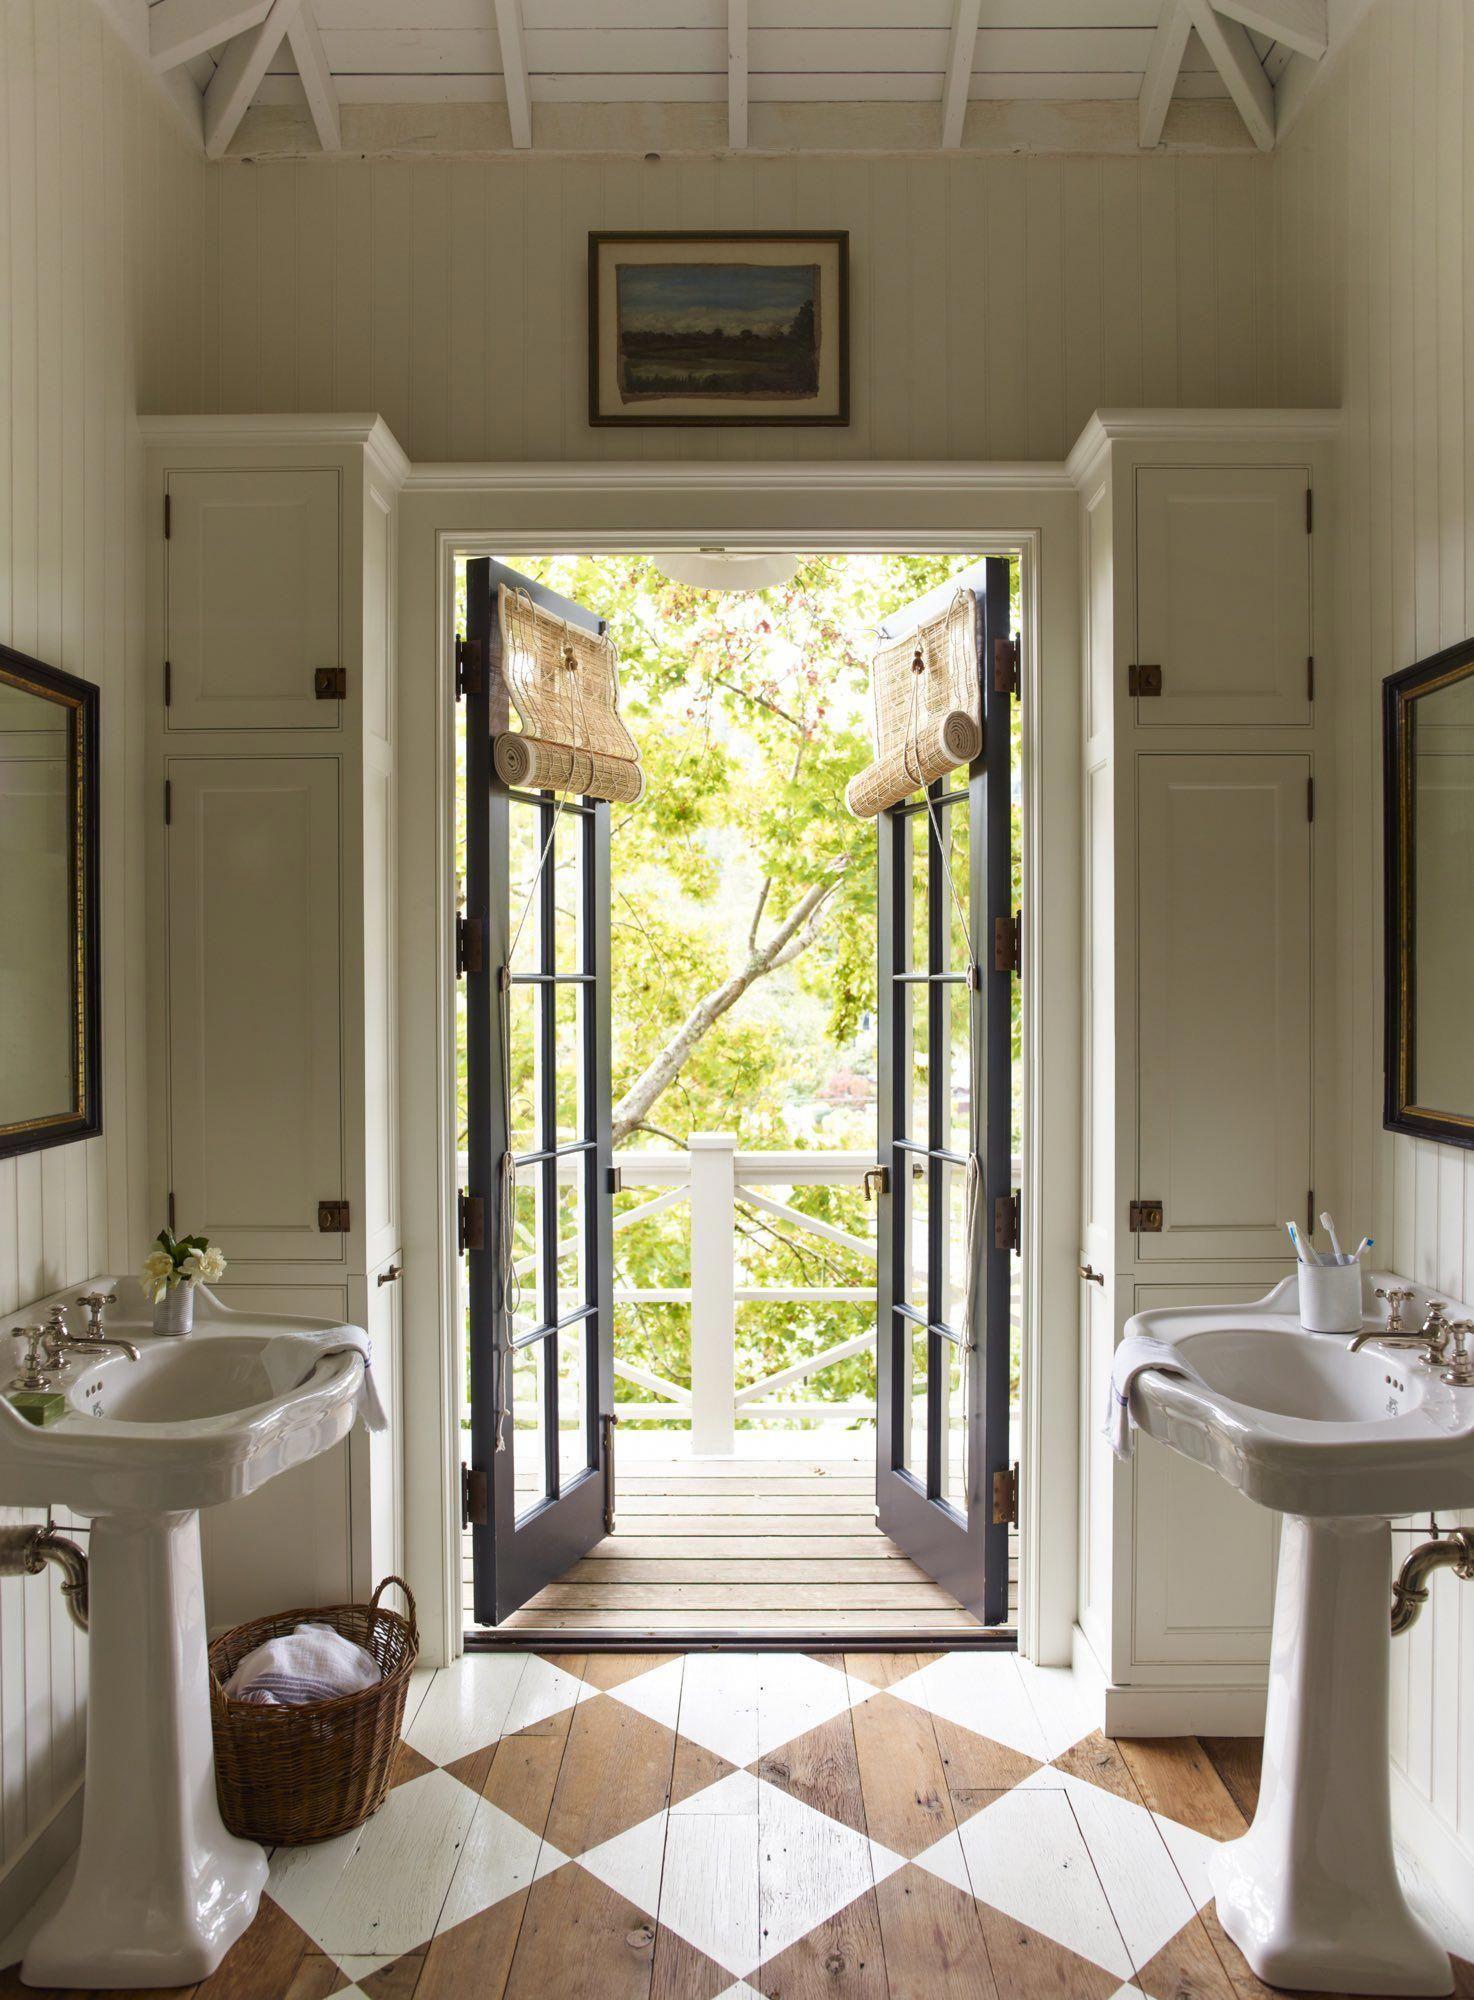 What To Do When You Find Bathroom Mold Bathroom Ideas Bathroom